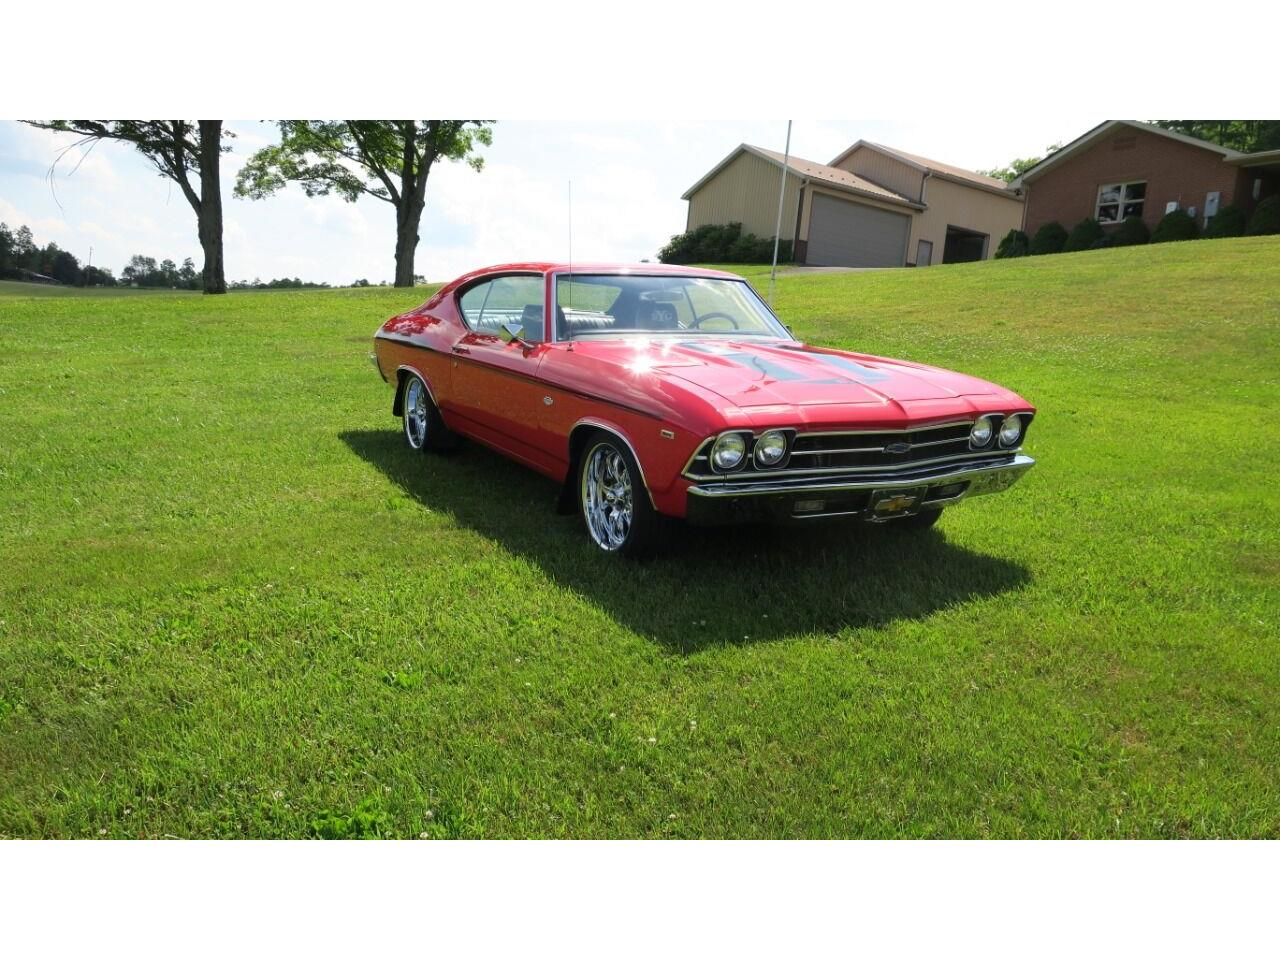 1969 Chevrolet Chevelle (CC-1364010) for sale in Clarksburg, Maryland